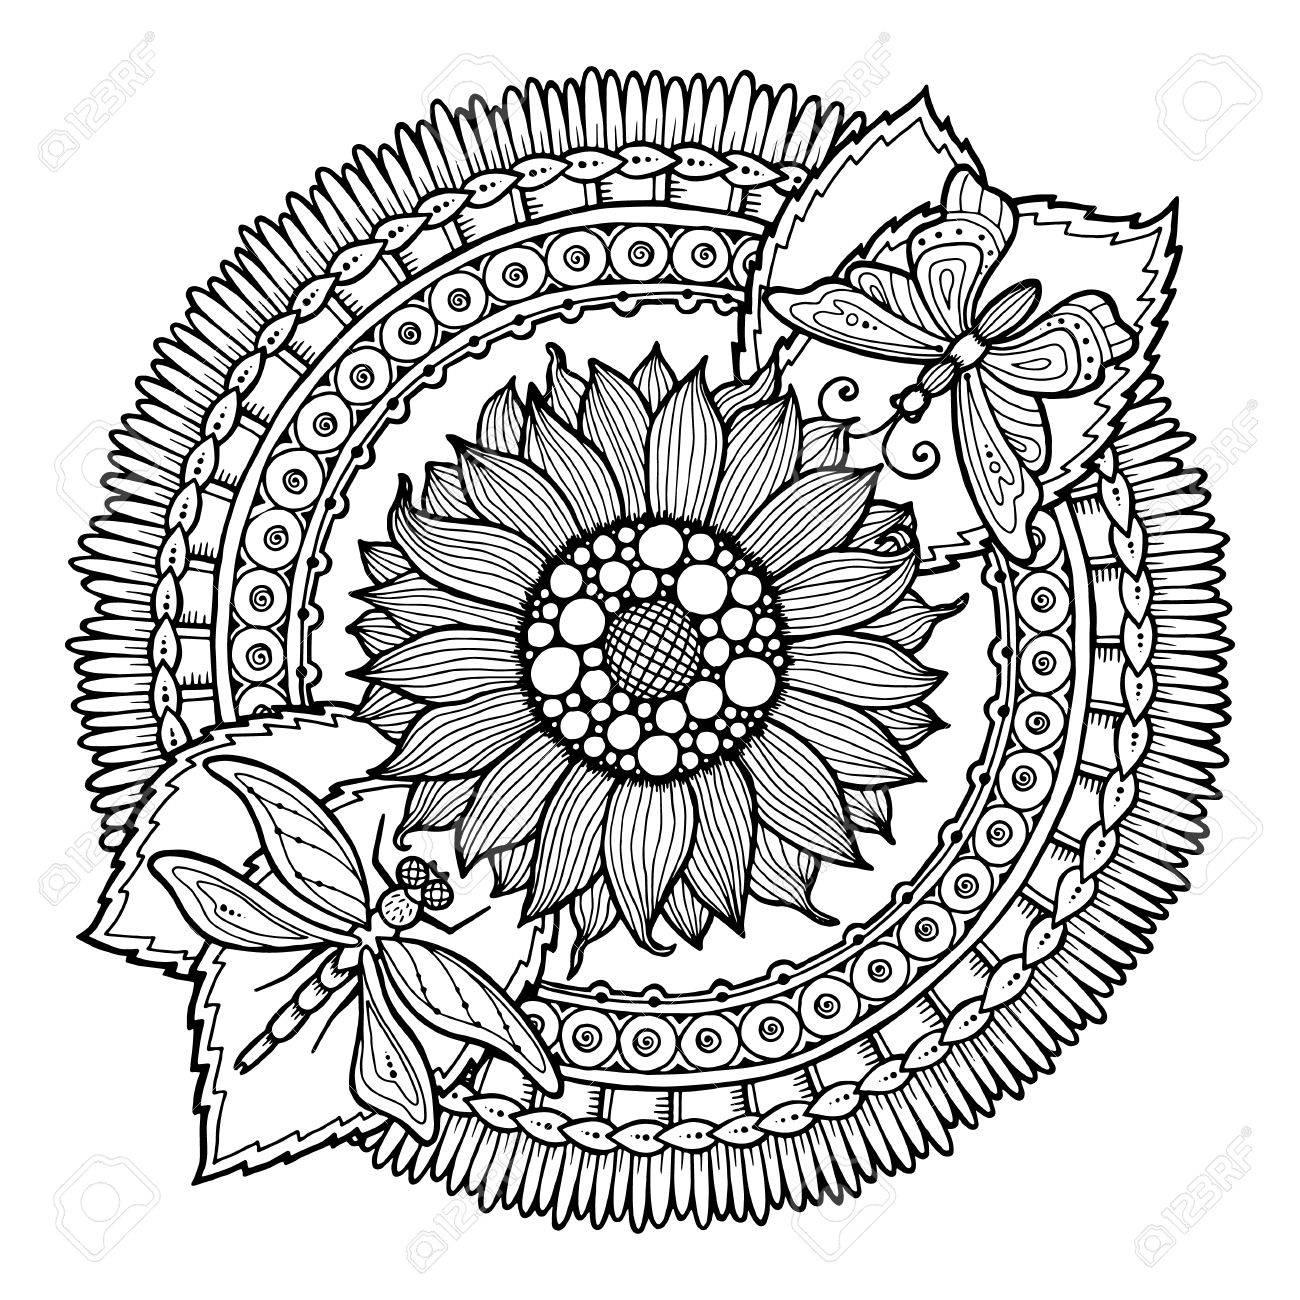 1300x1300 Circle Summer Doodle Flower Ornament. Hand Drawn Art Mandala